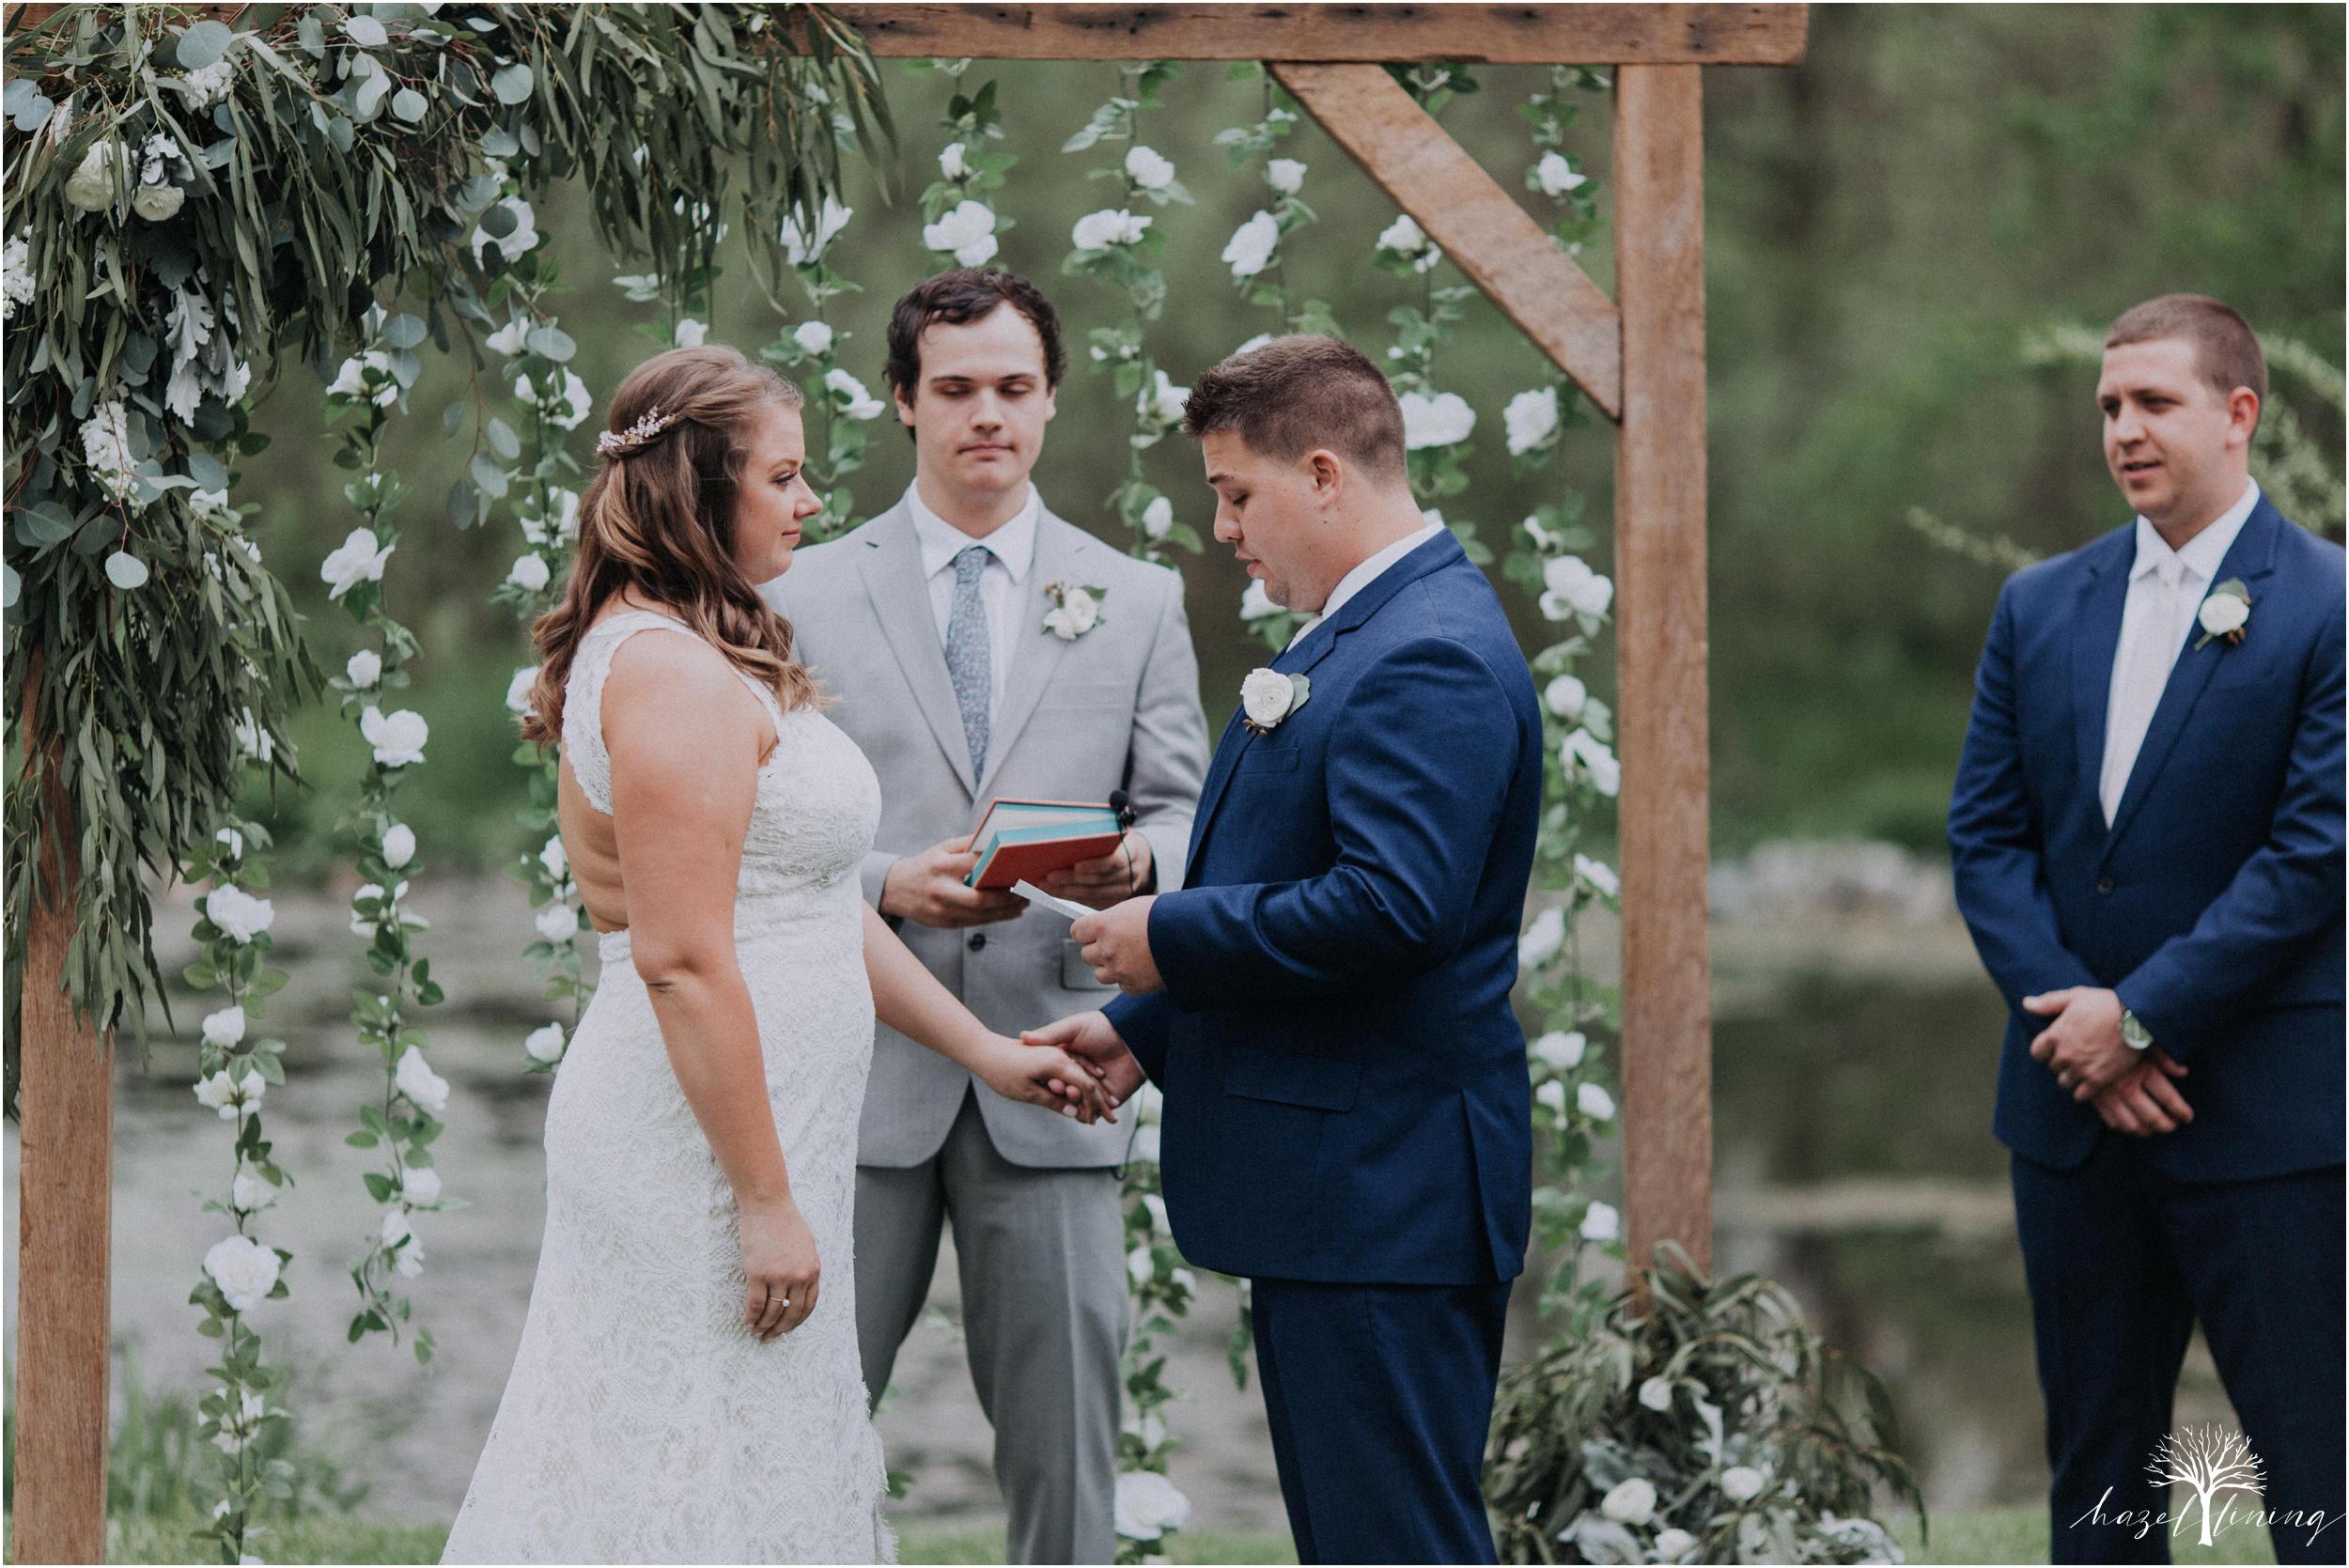 hazel-lining-travel-wedding-elopement-photography-abby-skyler-hunt-the-willis-house-york-pennsylvania-outdoor-estate-wedding_0092.jpg